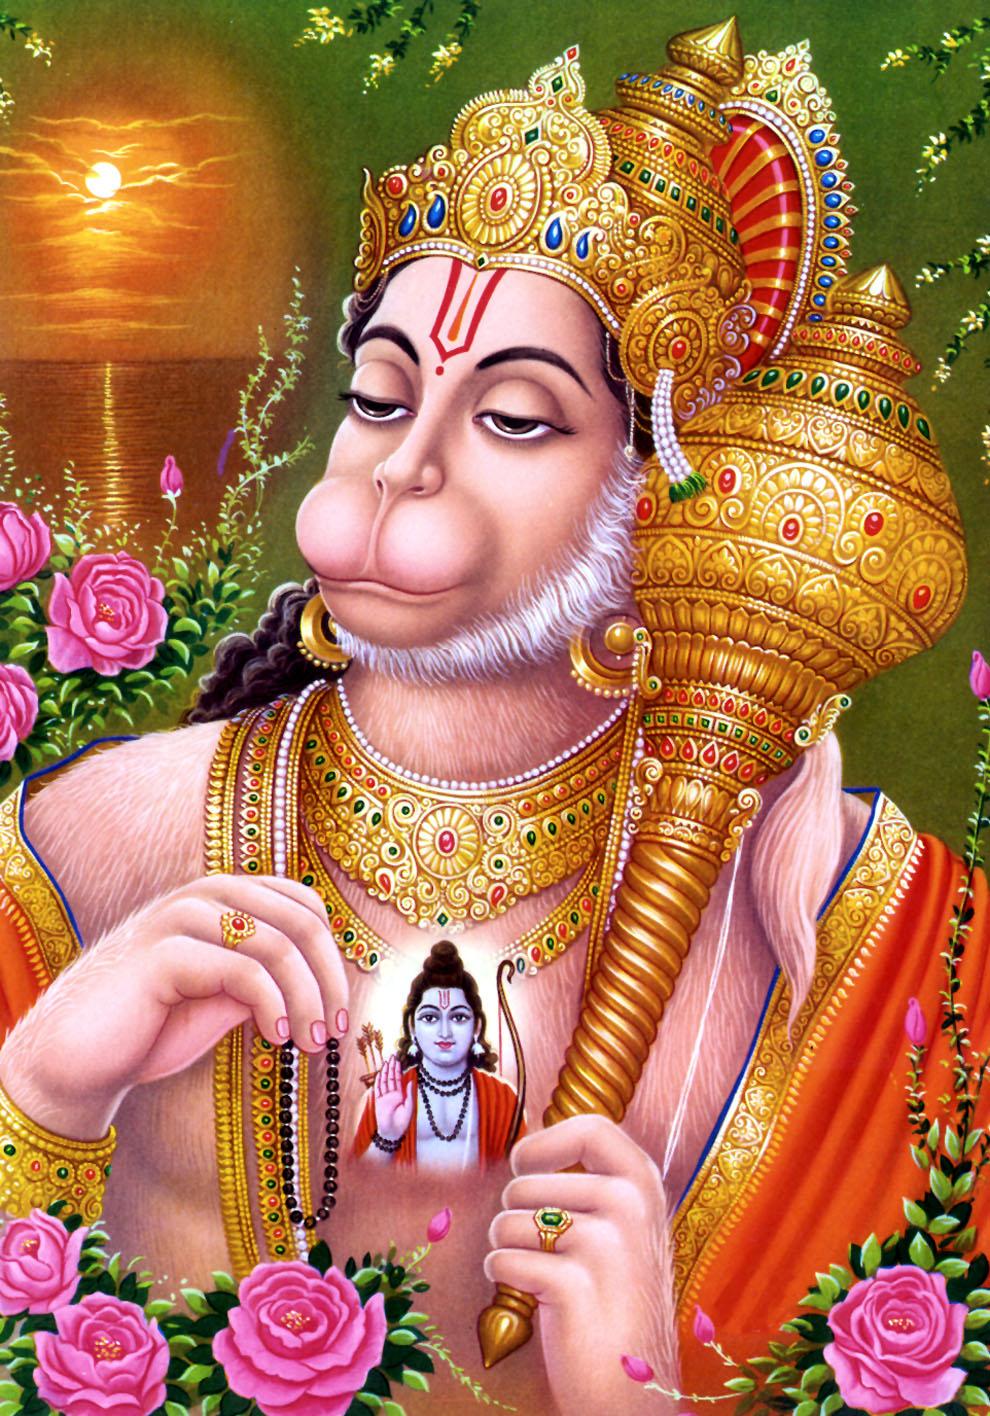 God Wallpapers of Hanuman